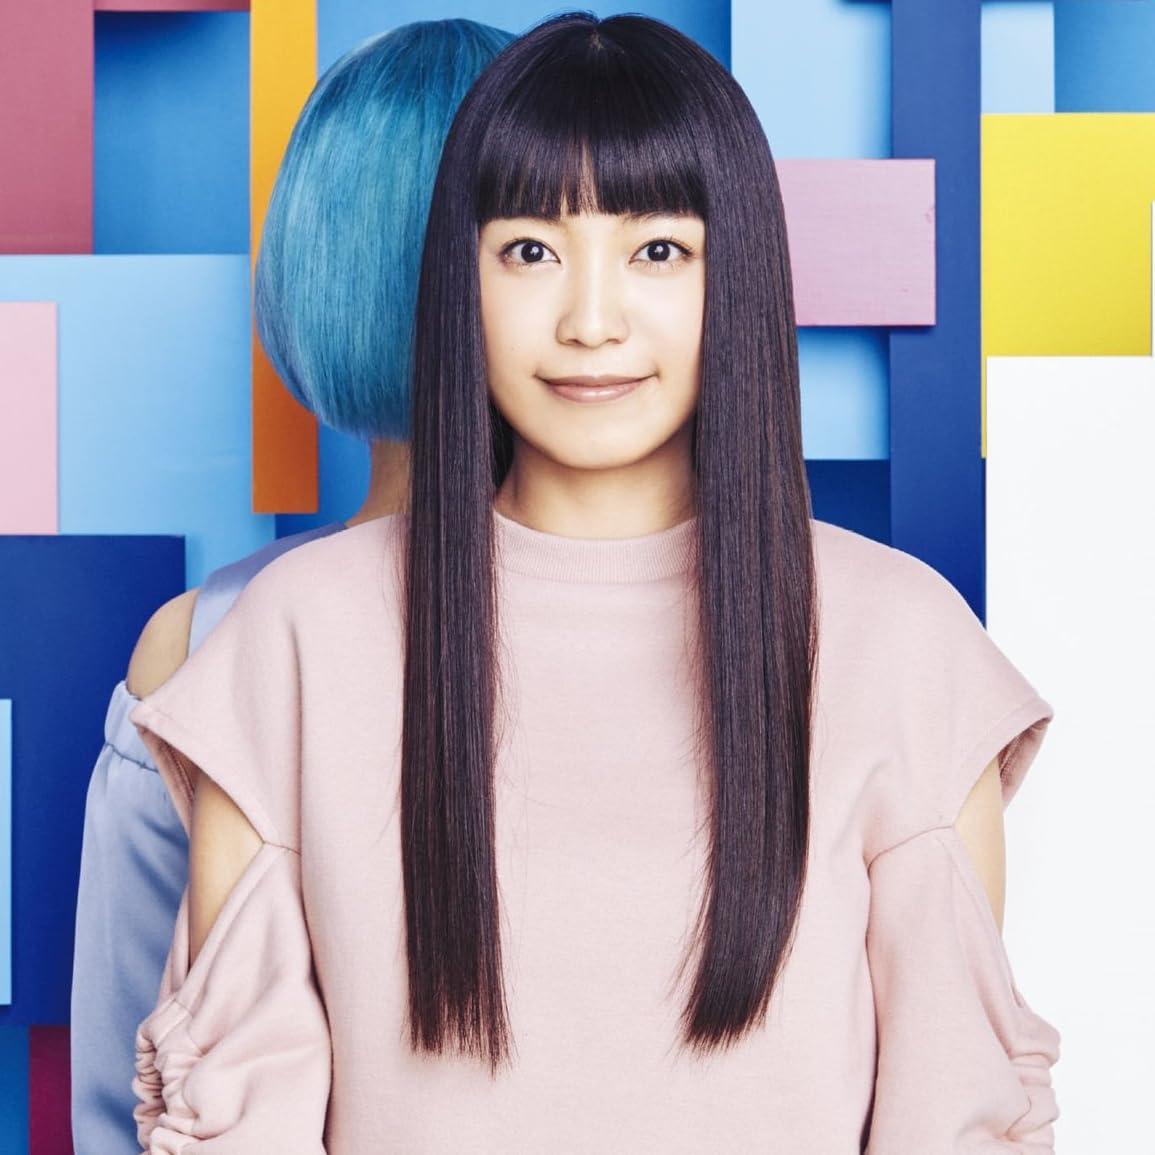 Miwa Ipad壁紙 アップデート 女性タレント スマホ用画像